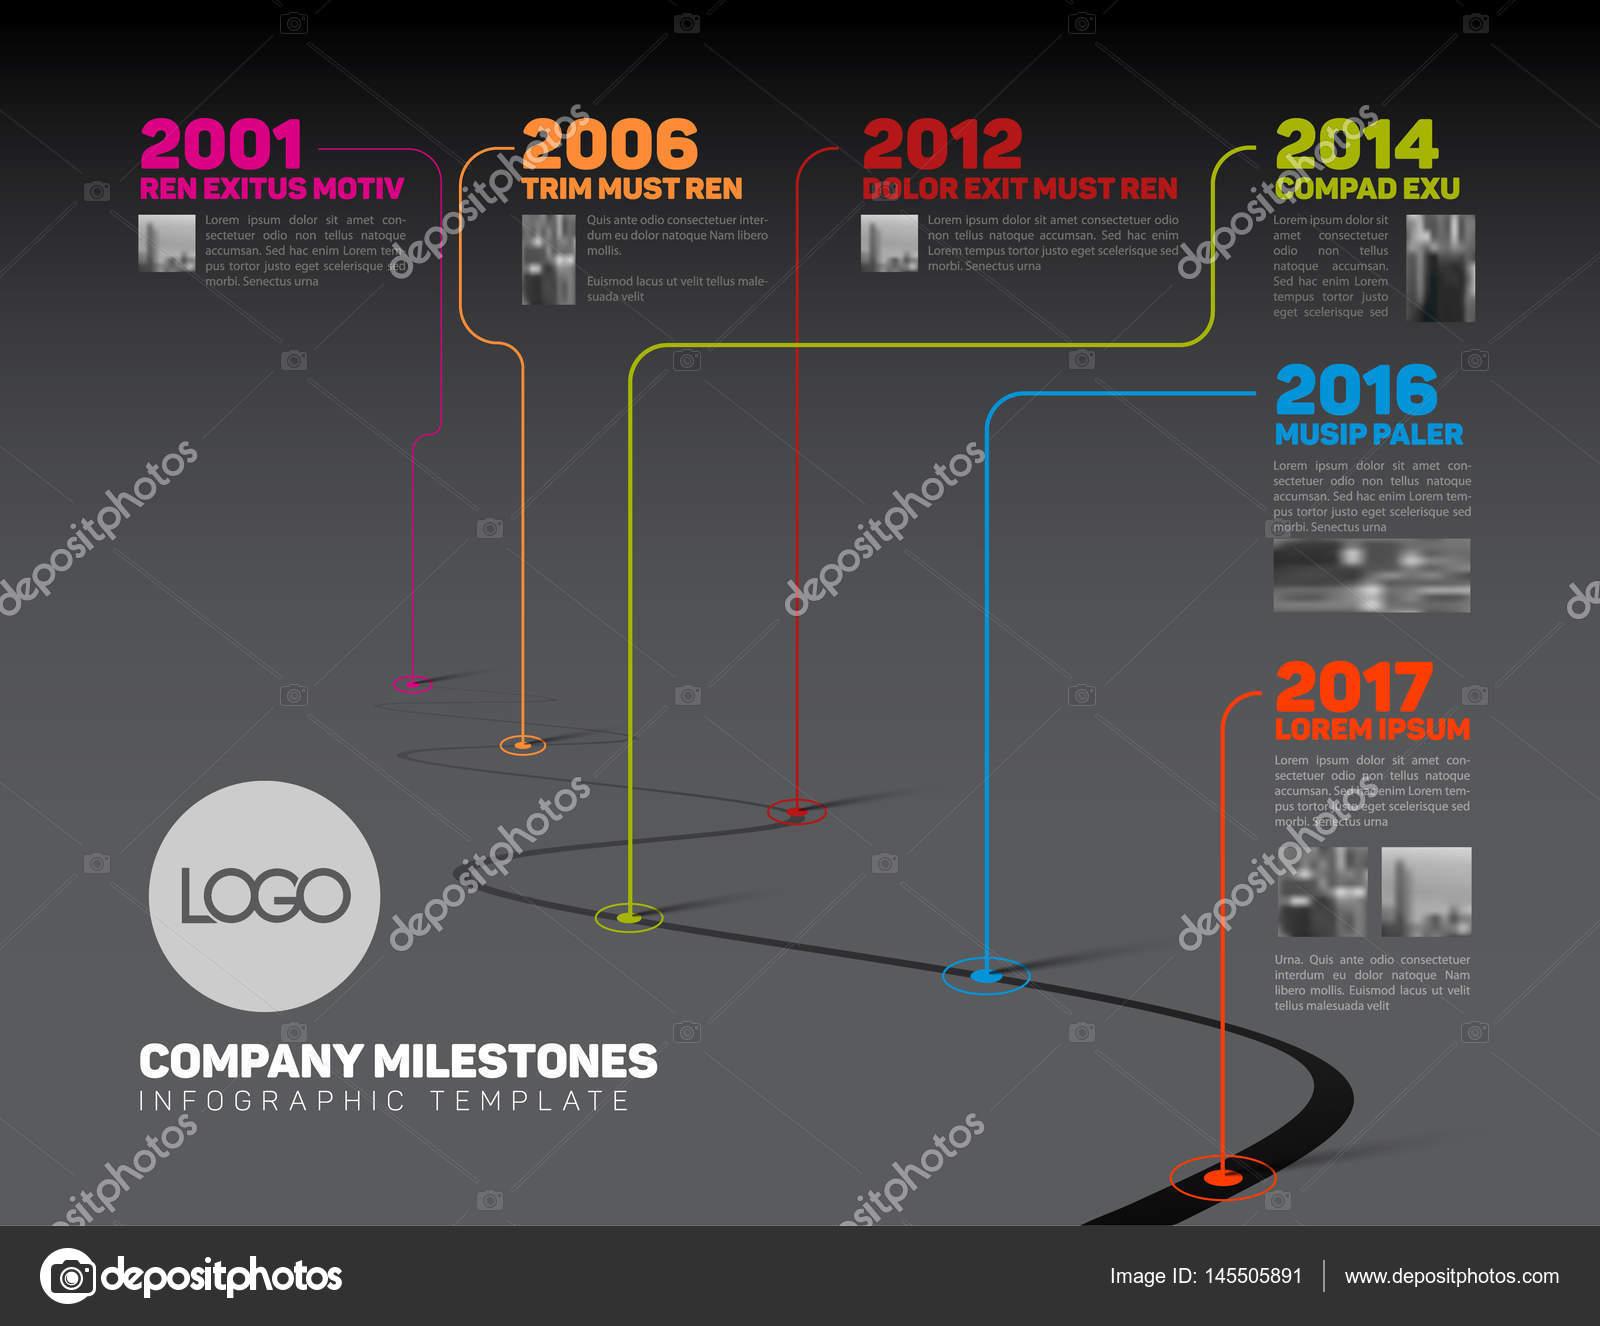 Company Milestones Timeline Template — Stock Vector © orson #145505891